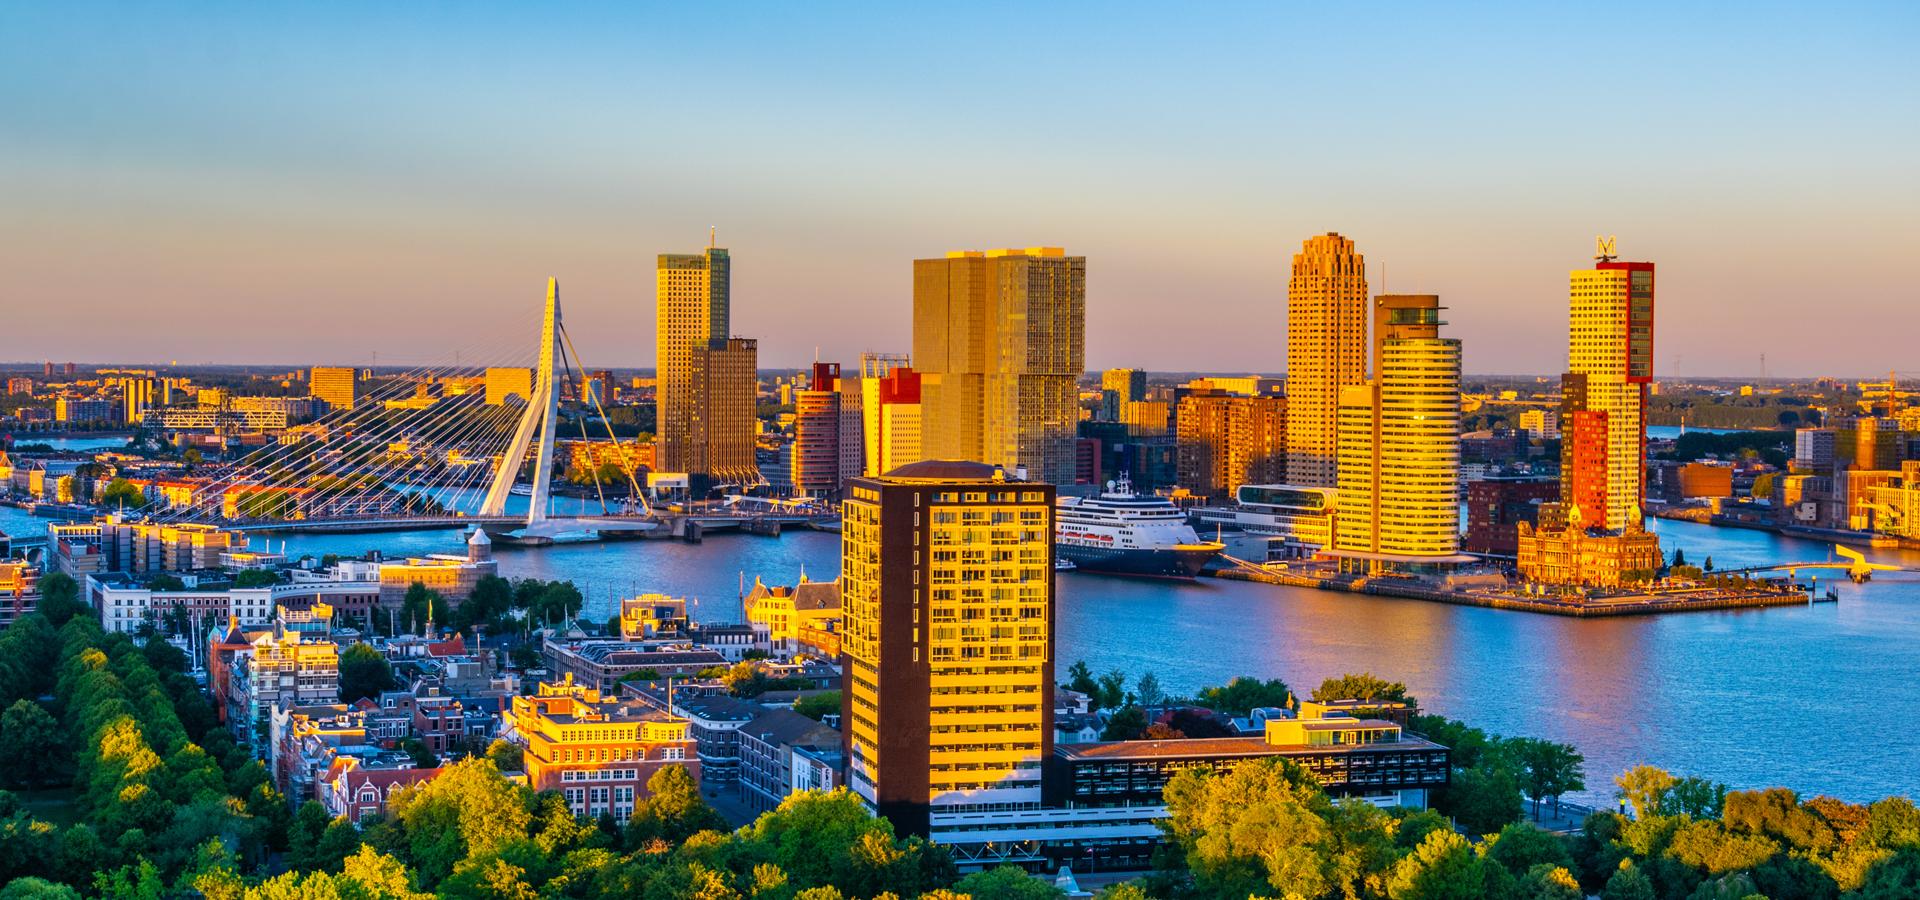 Peer-to-peer advisory in Rotterdam, South Holland, Netherlands